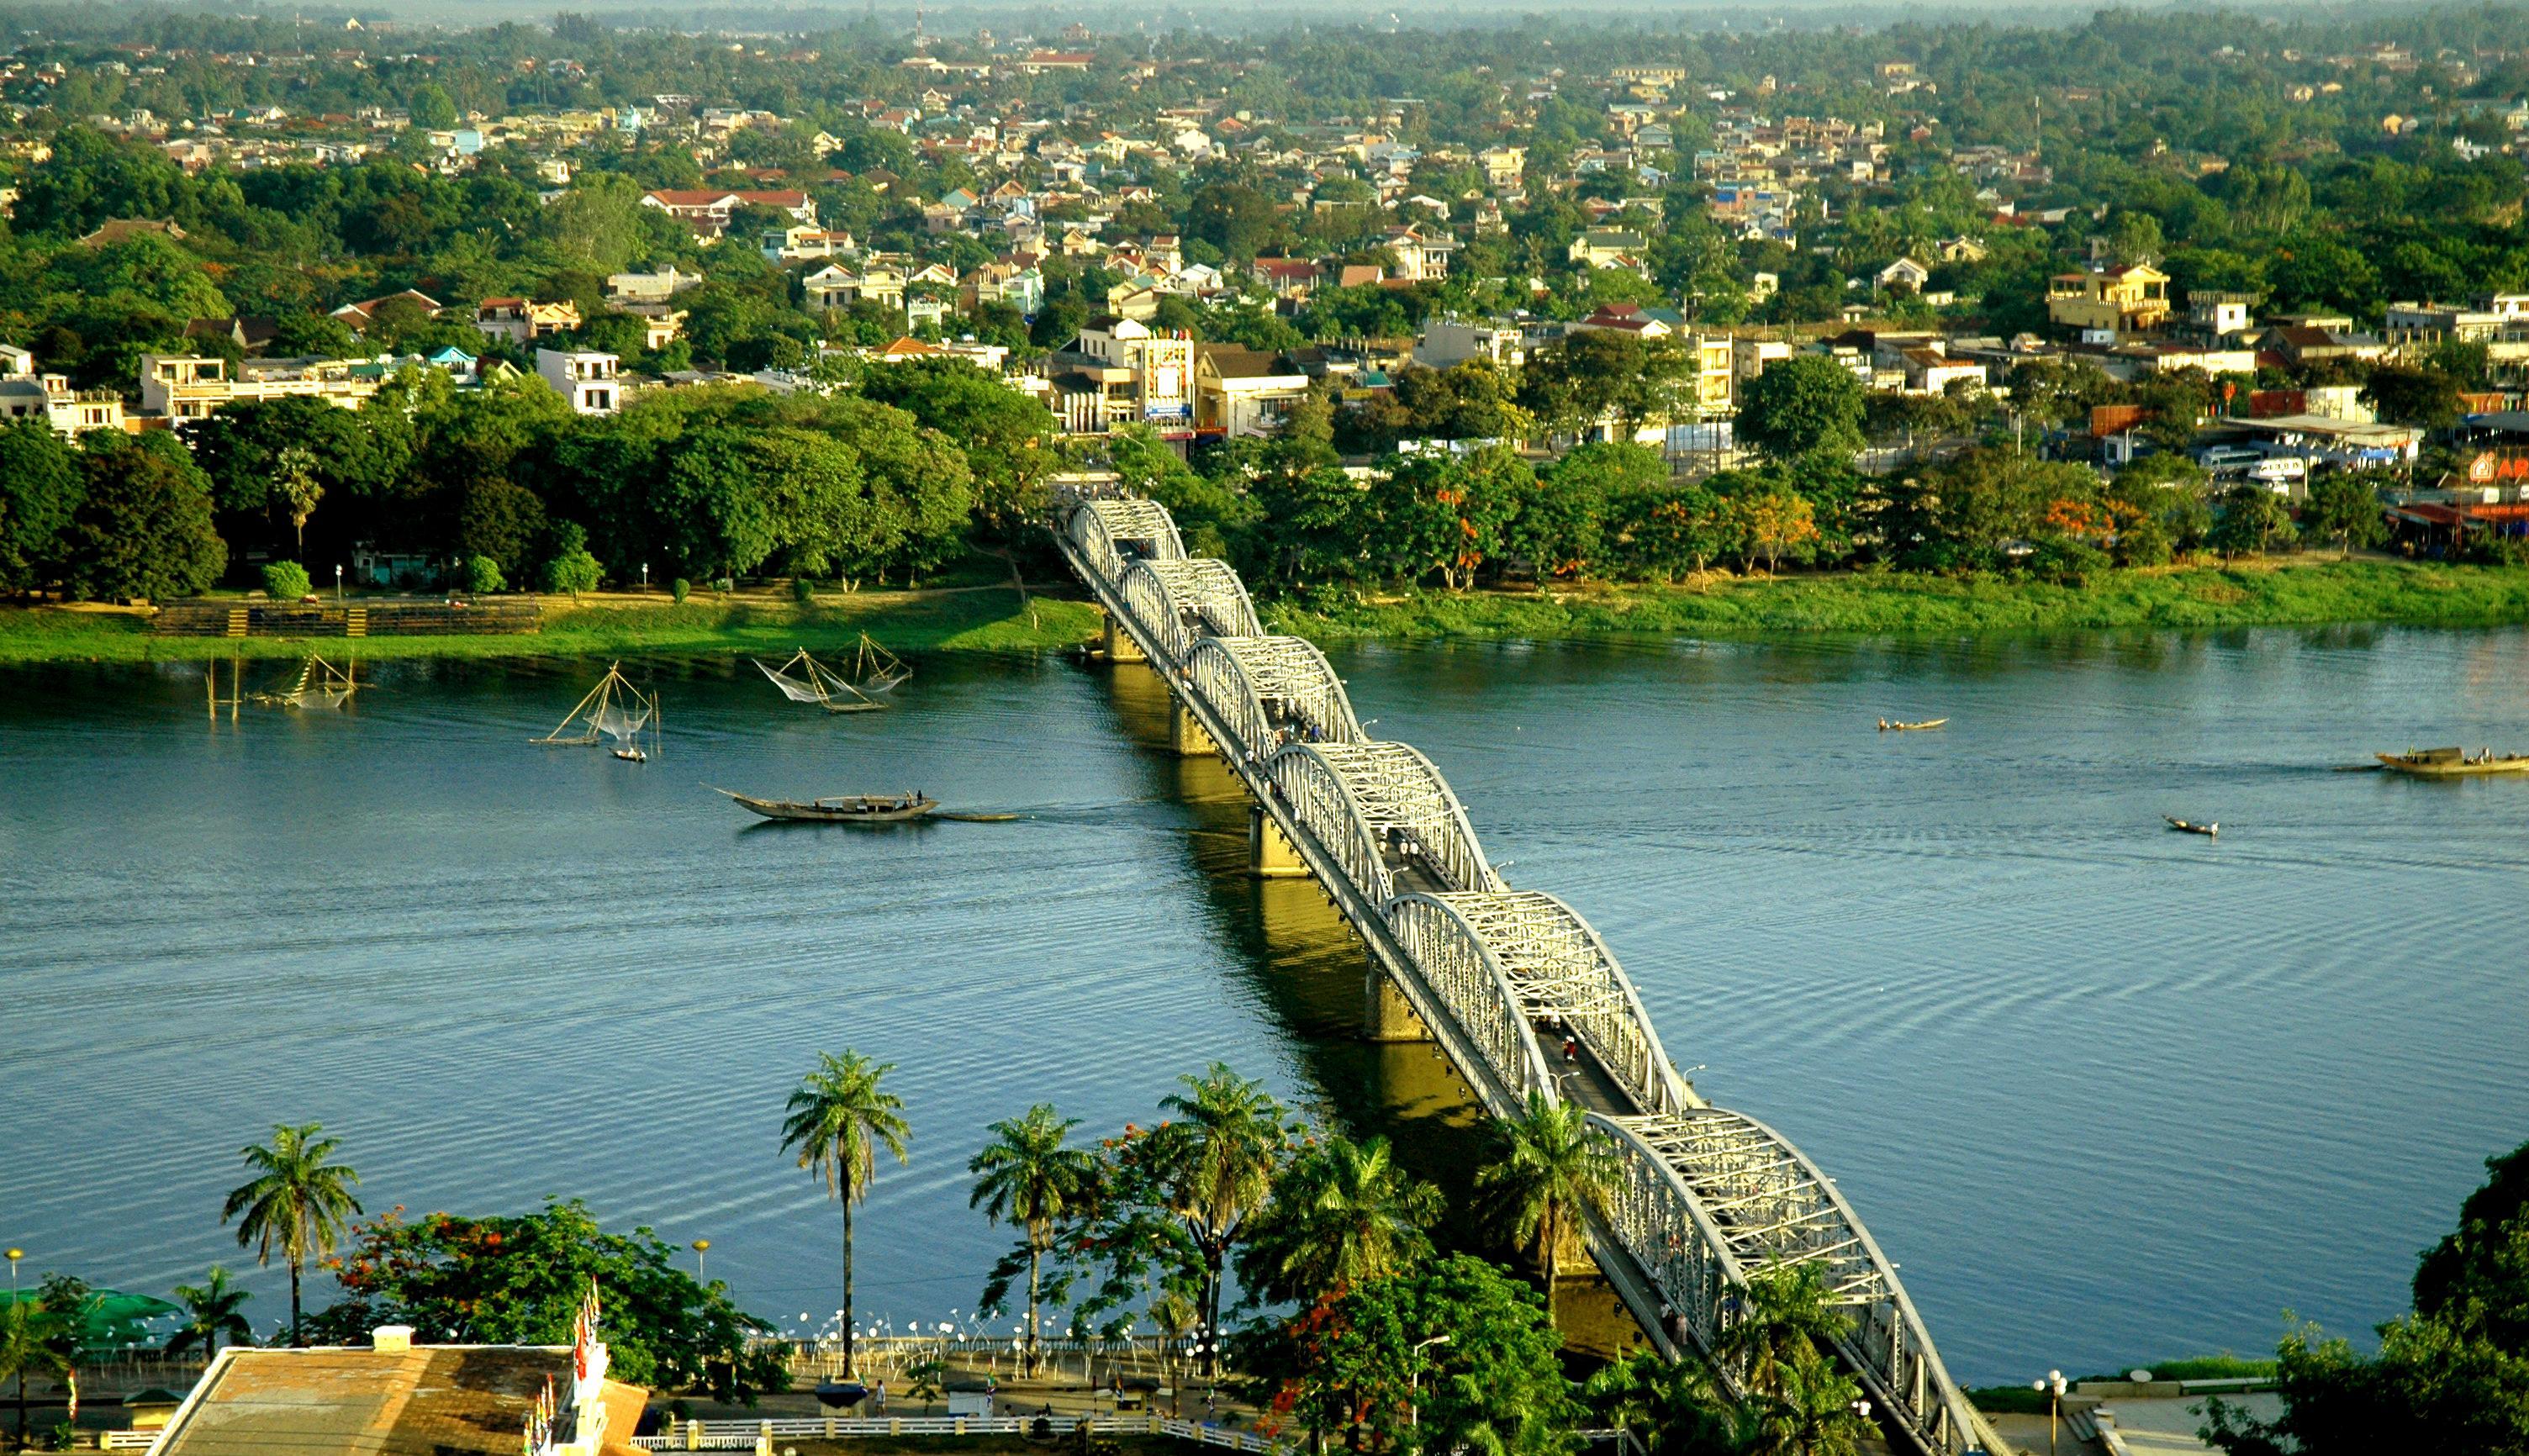 Perfume River - Truong Tien Bridge